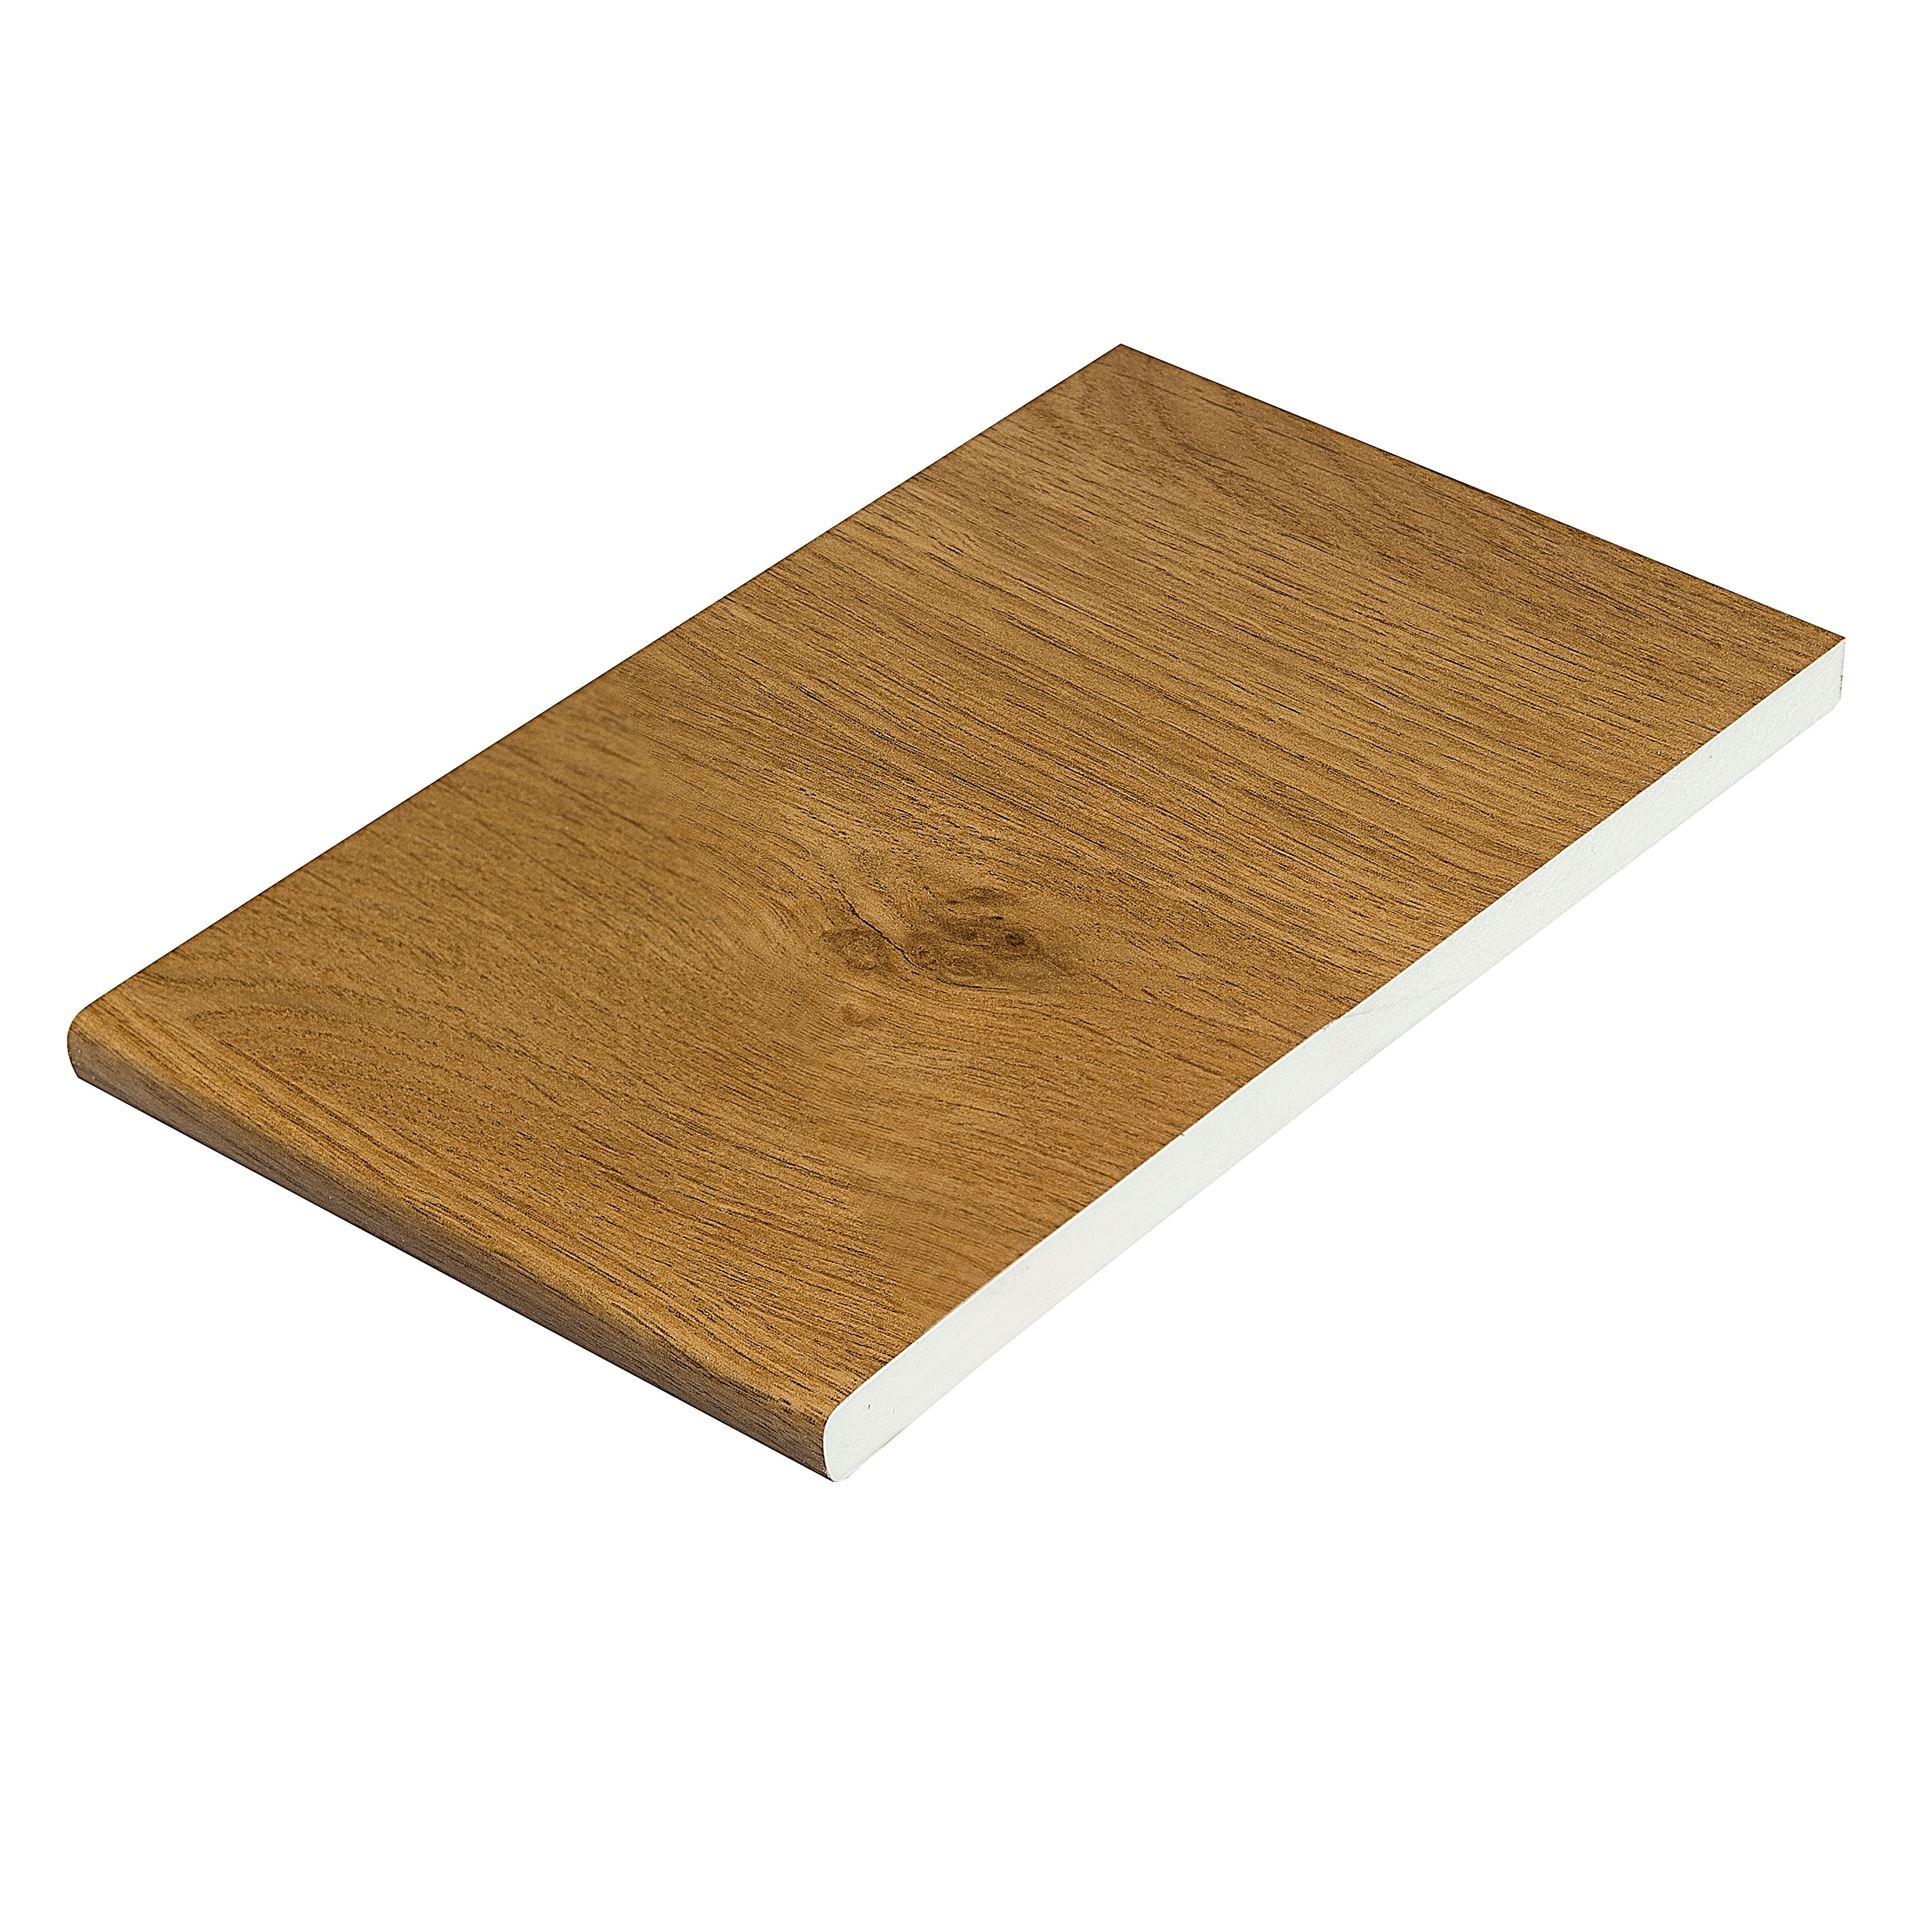 Irish Oak Flat Board